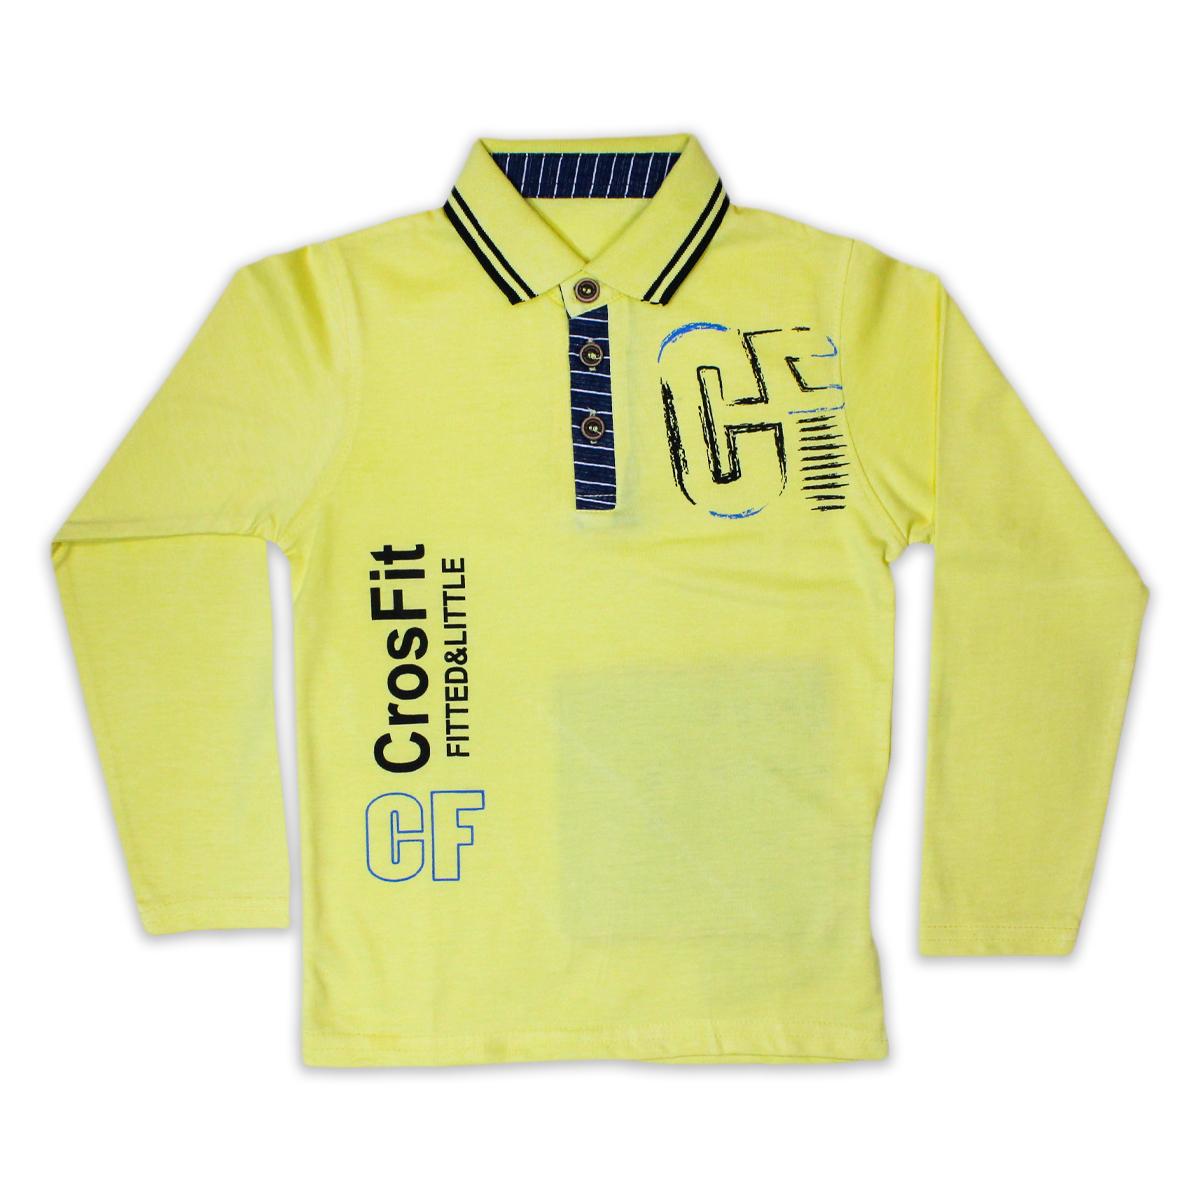 Cut Price Boys Polo T-shirt 3 Yrs - 10 Yrs Printed Cf Yellow